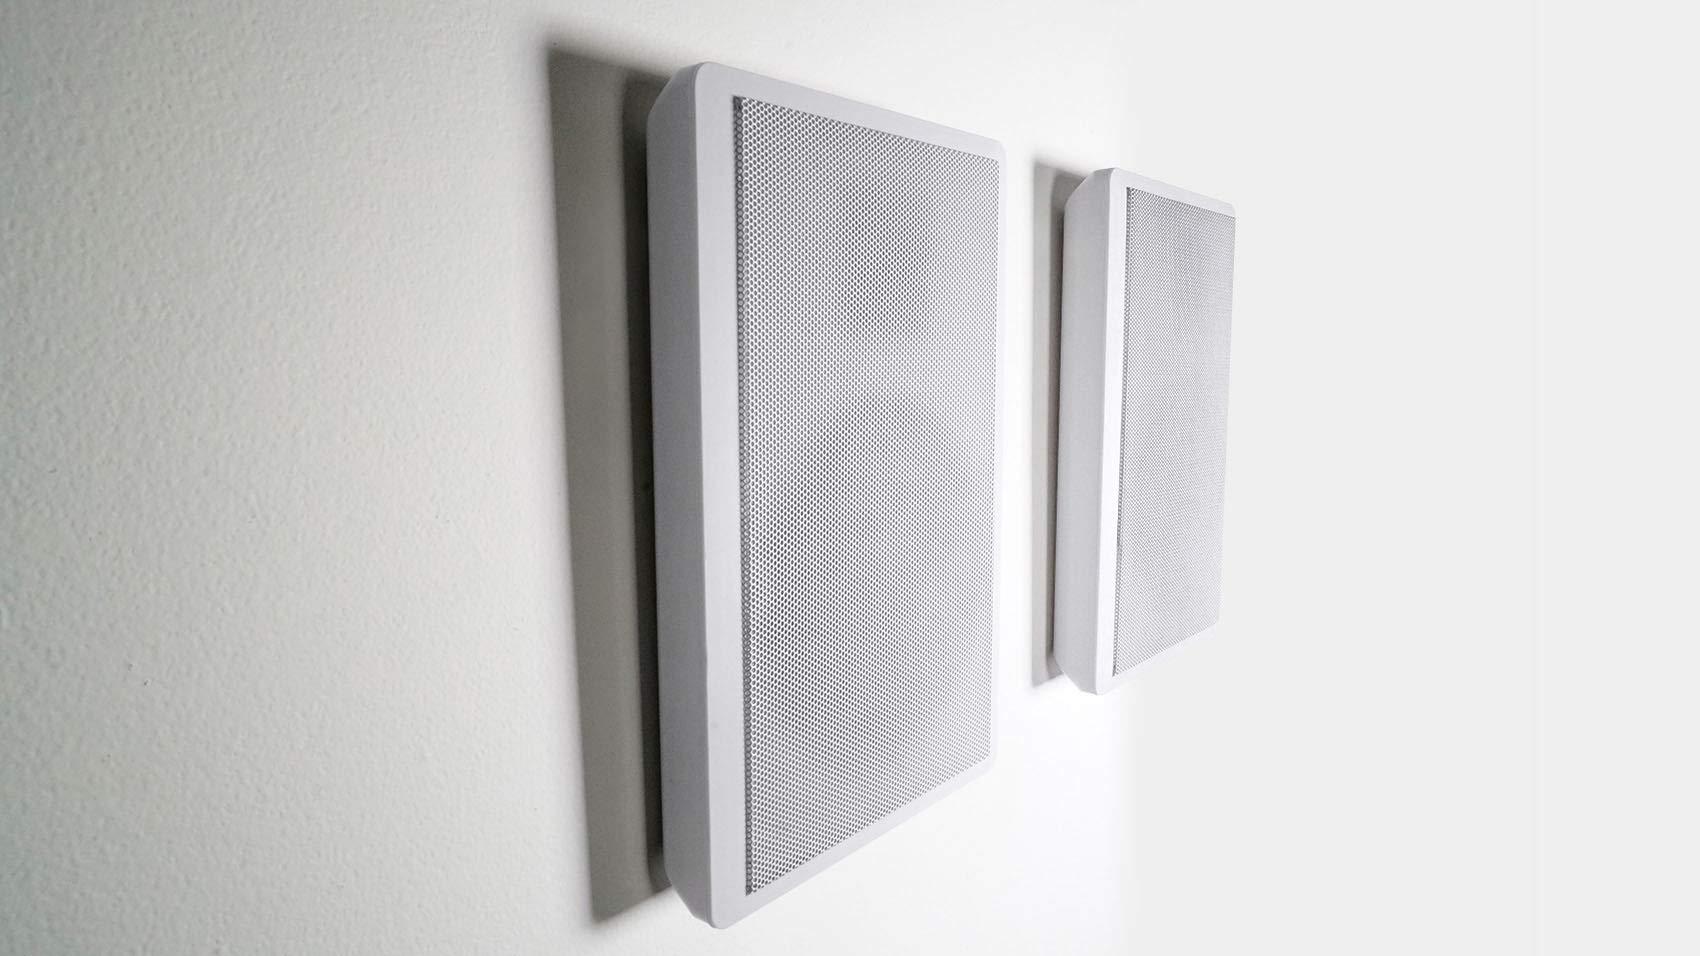 2 Rockville RockSlim White Home Theater 5.25'' 240w Easy Wall Mount Slim Speakers